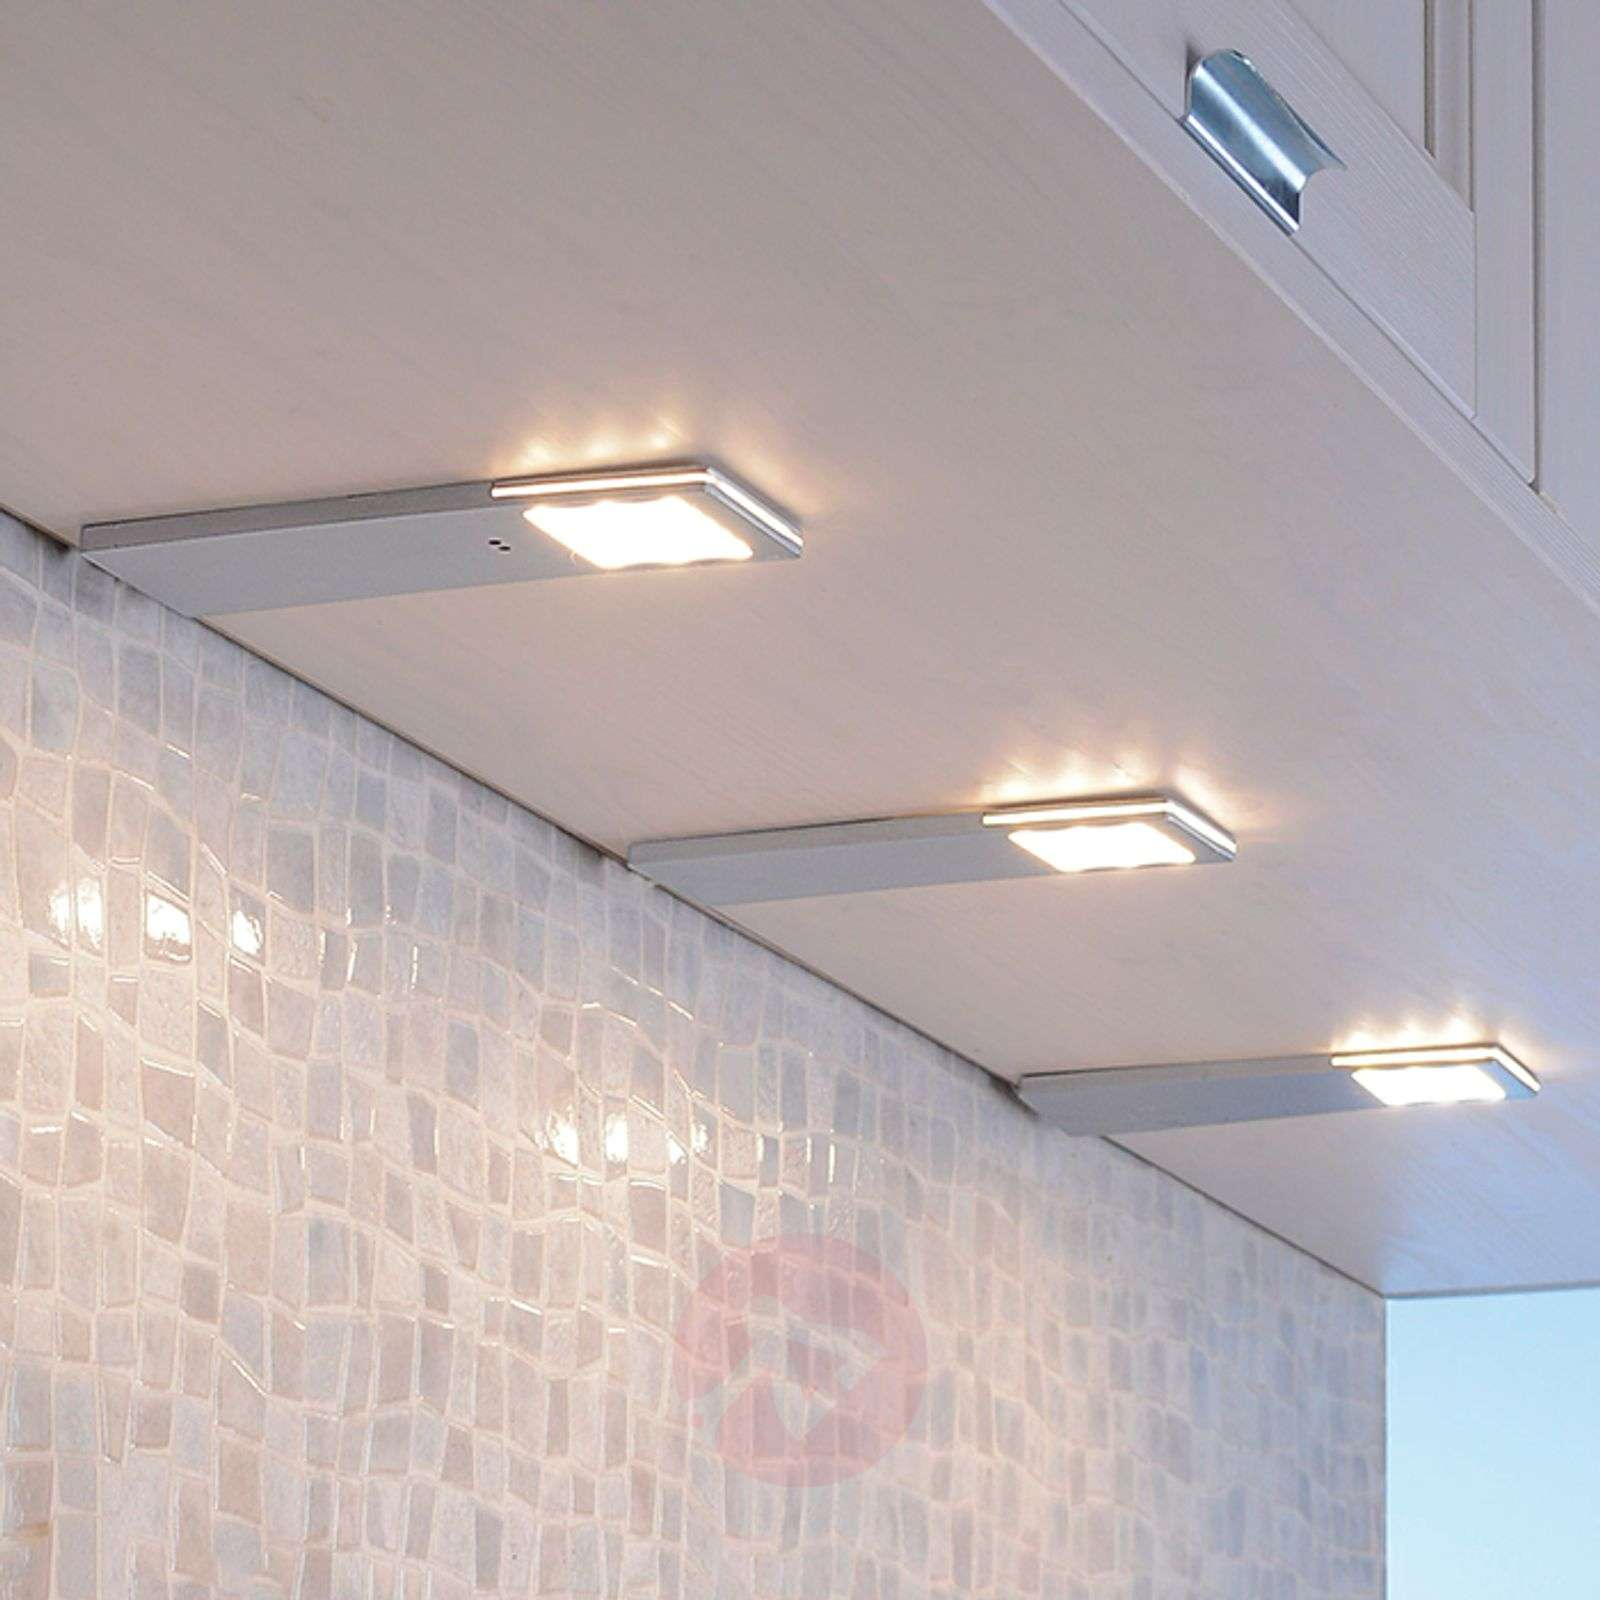 LED-kaapinalusvalo Helena 3:n setti 6,6 cm leveä-7610578-02